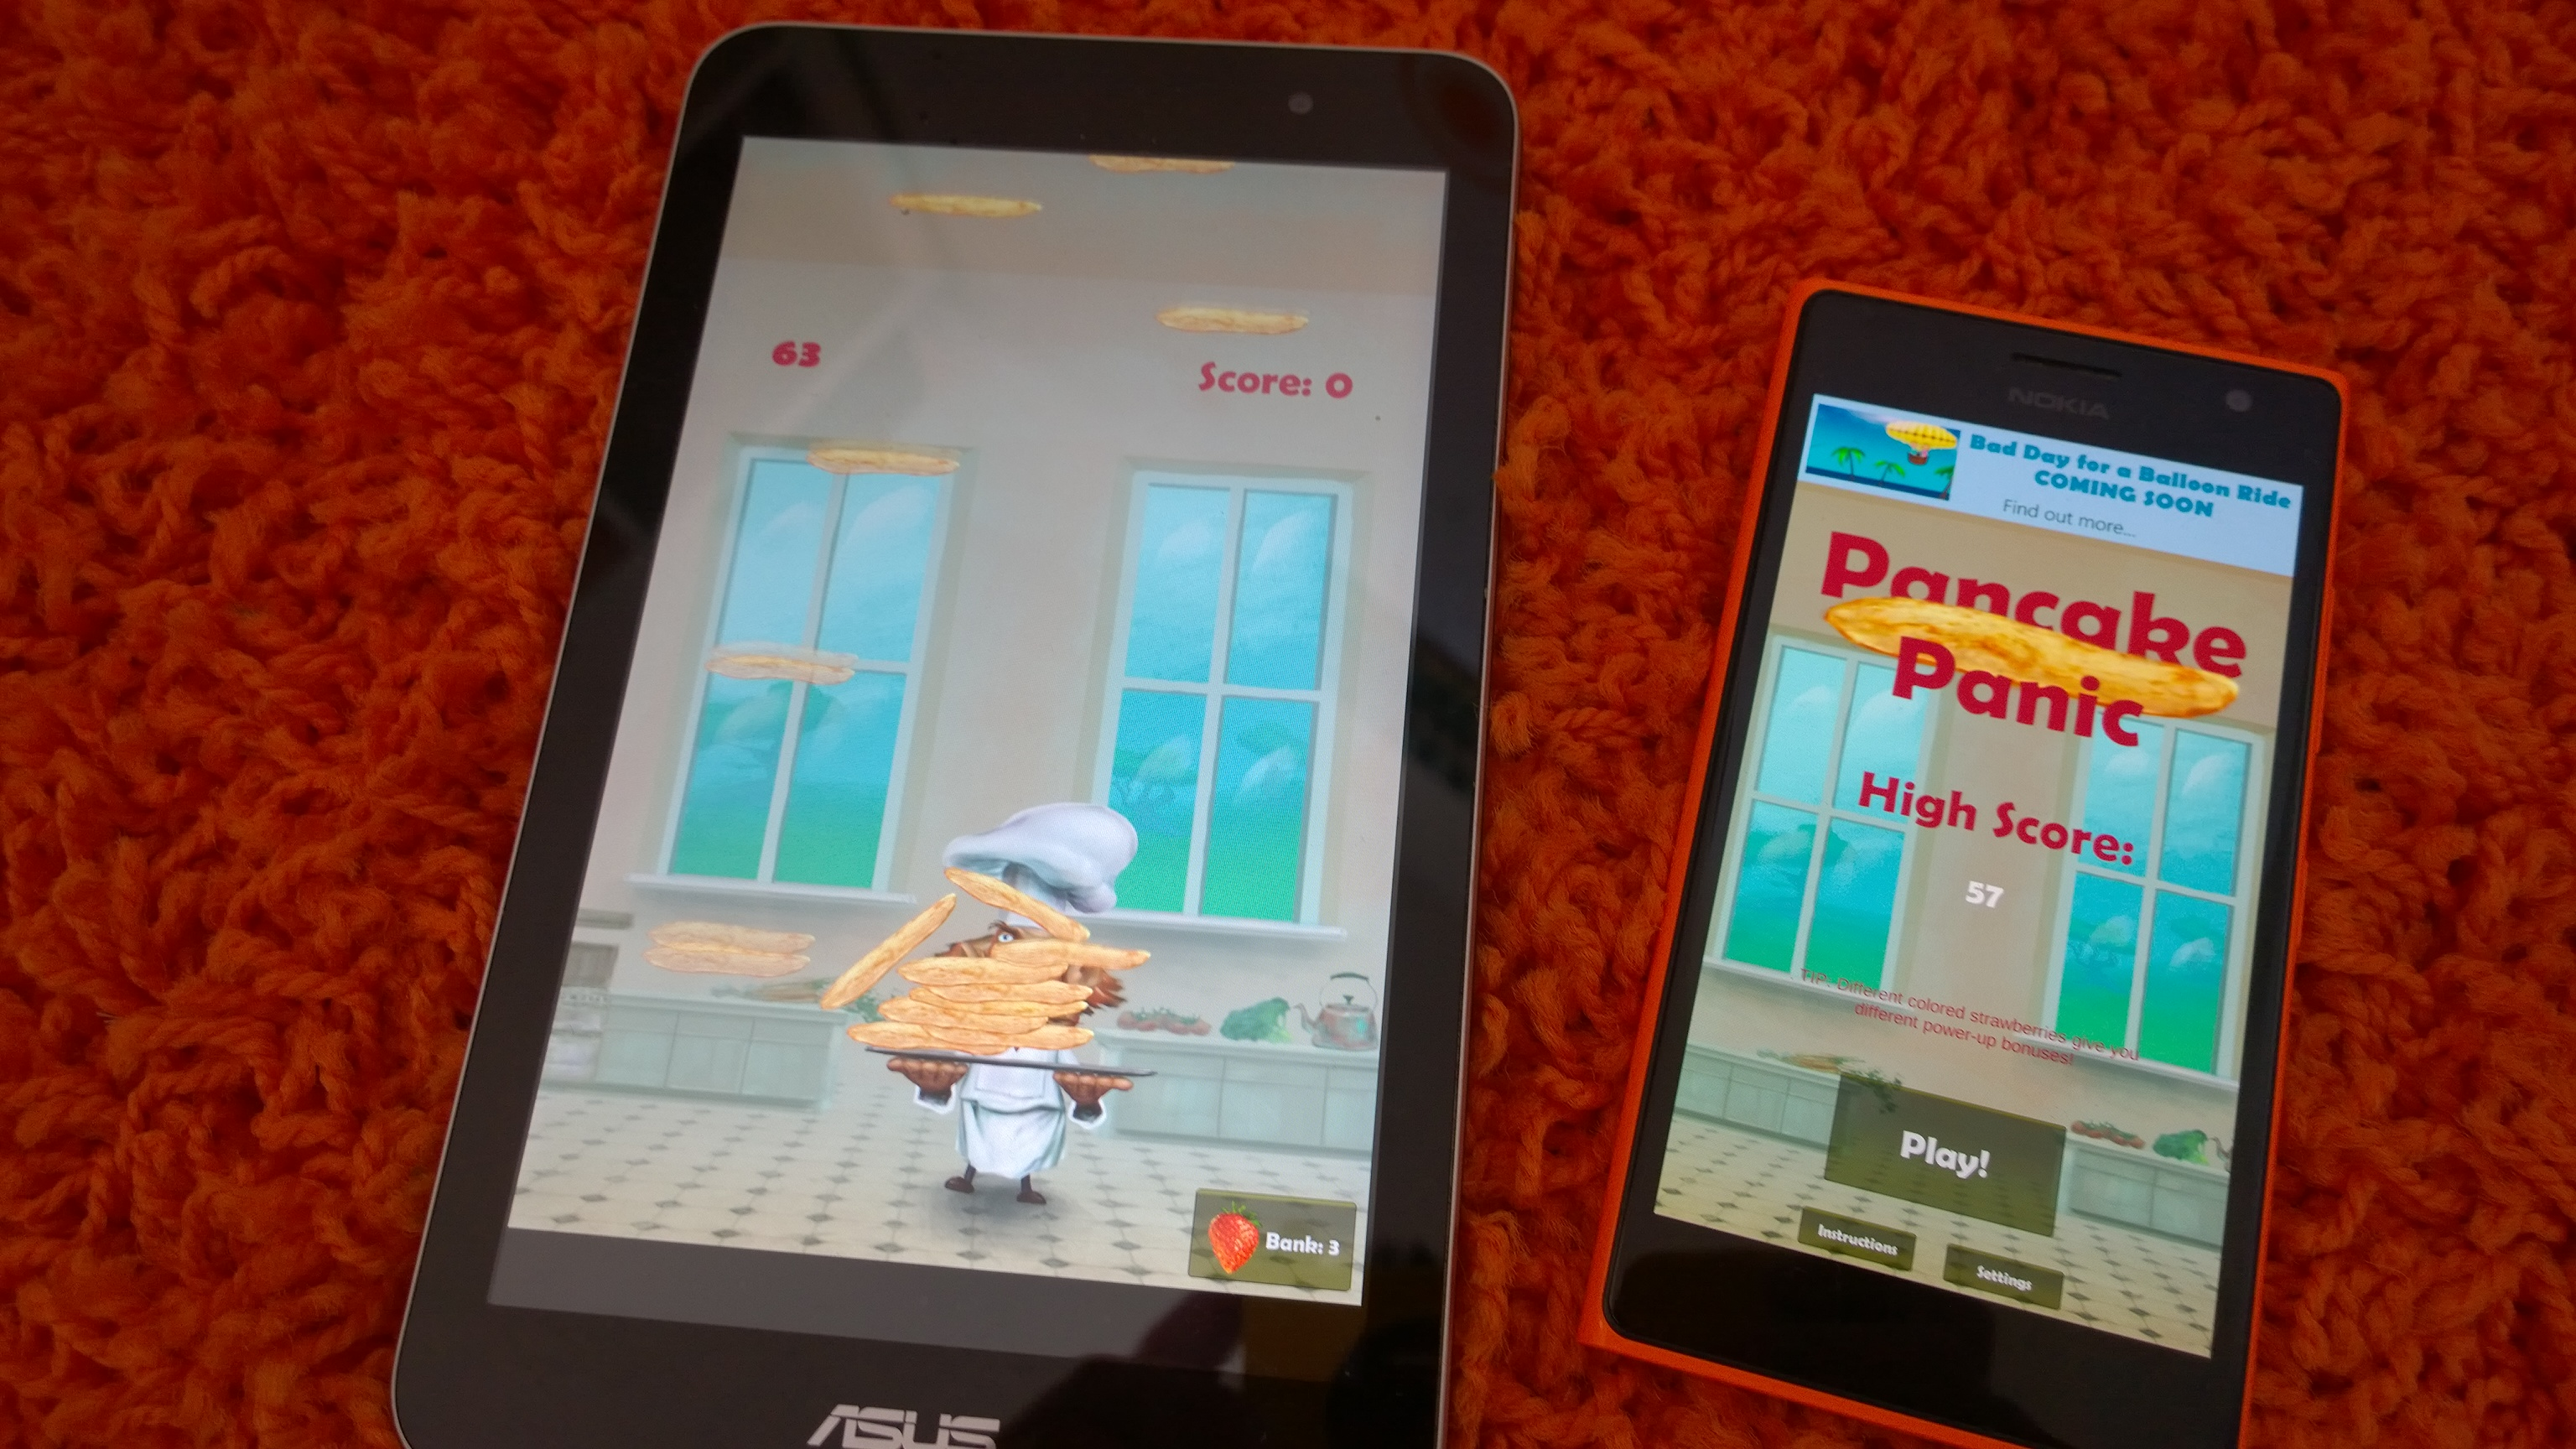 Pancake Panic 2.2 for Android, Windows, and Windows Phone!